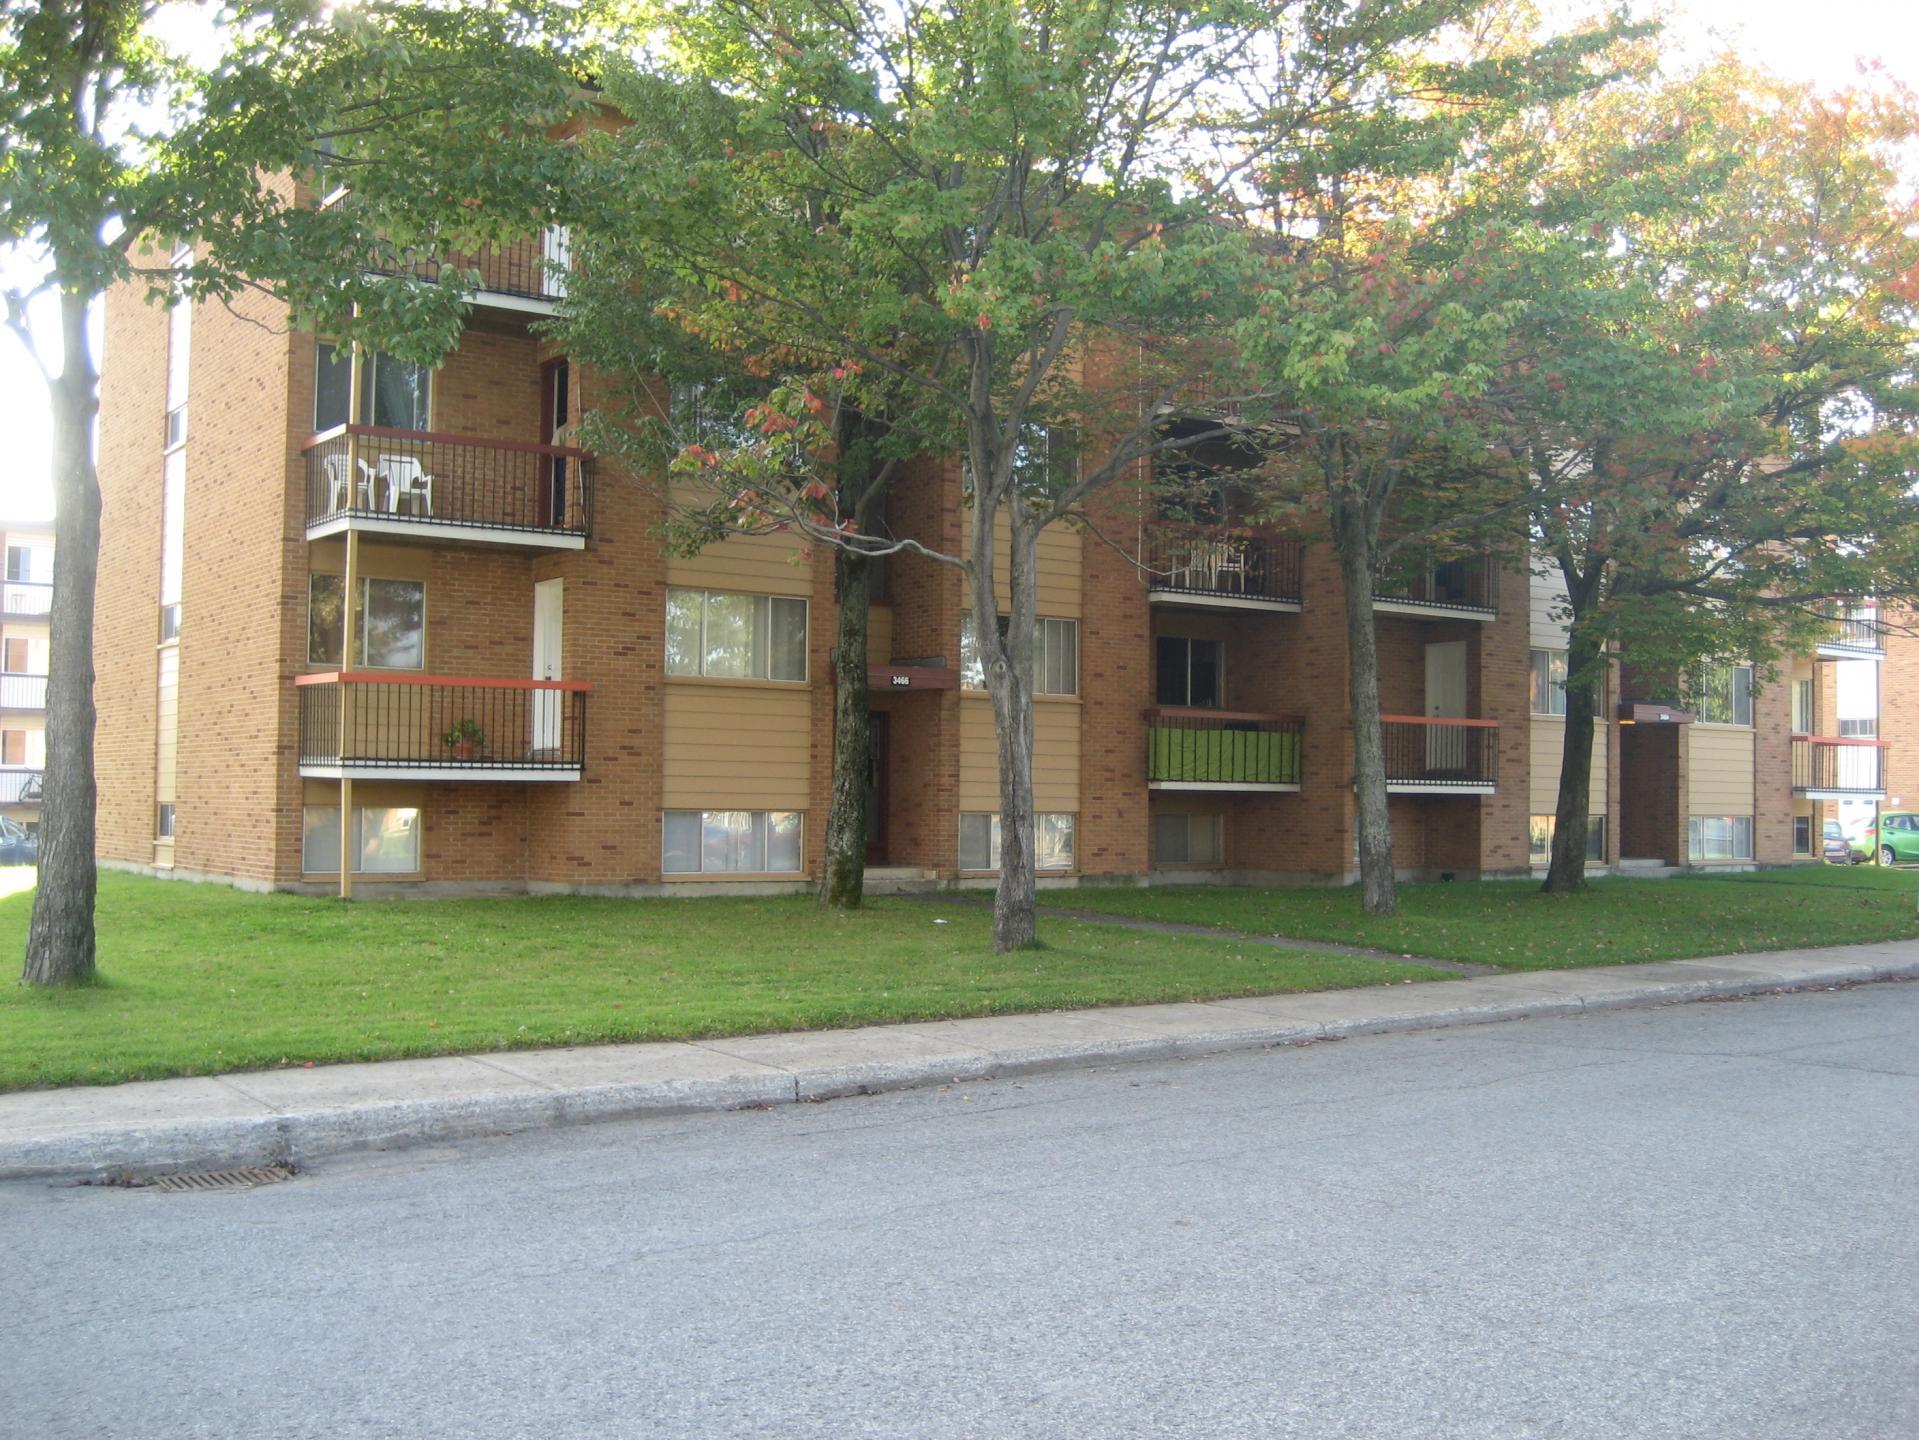 Immeubles ste foy septembre 2011 8